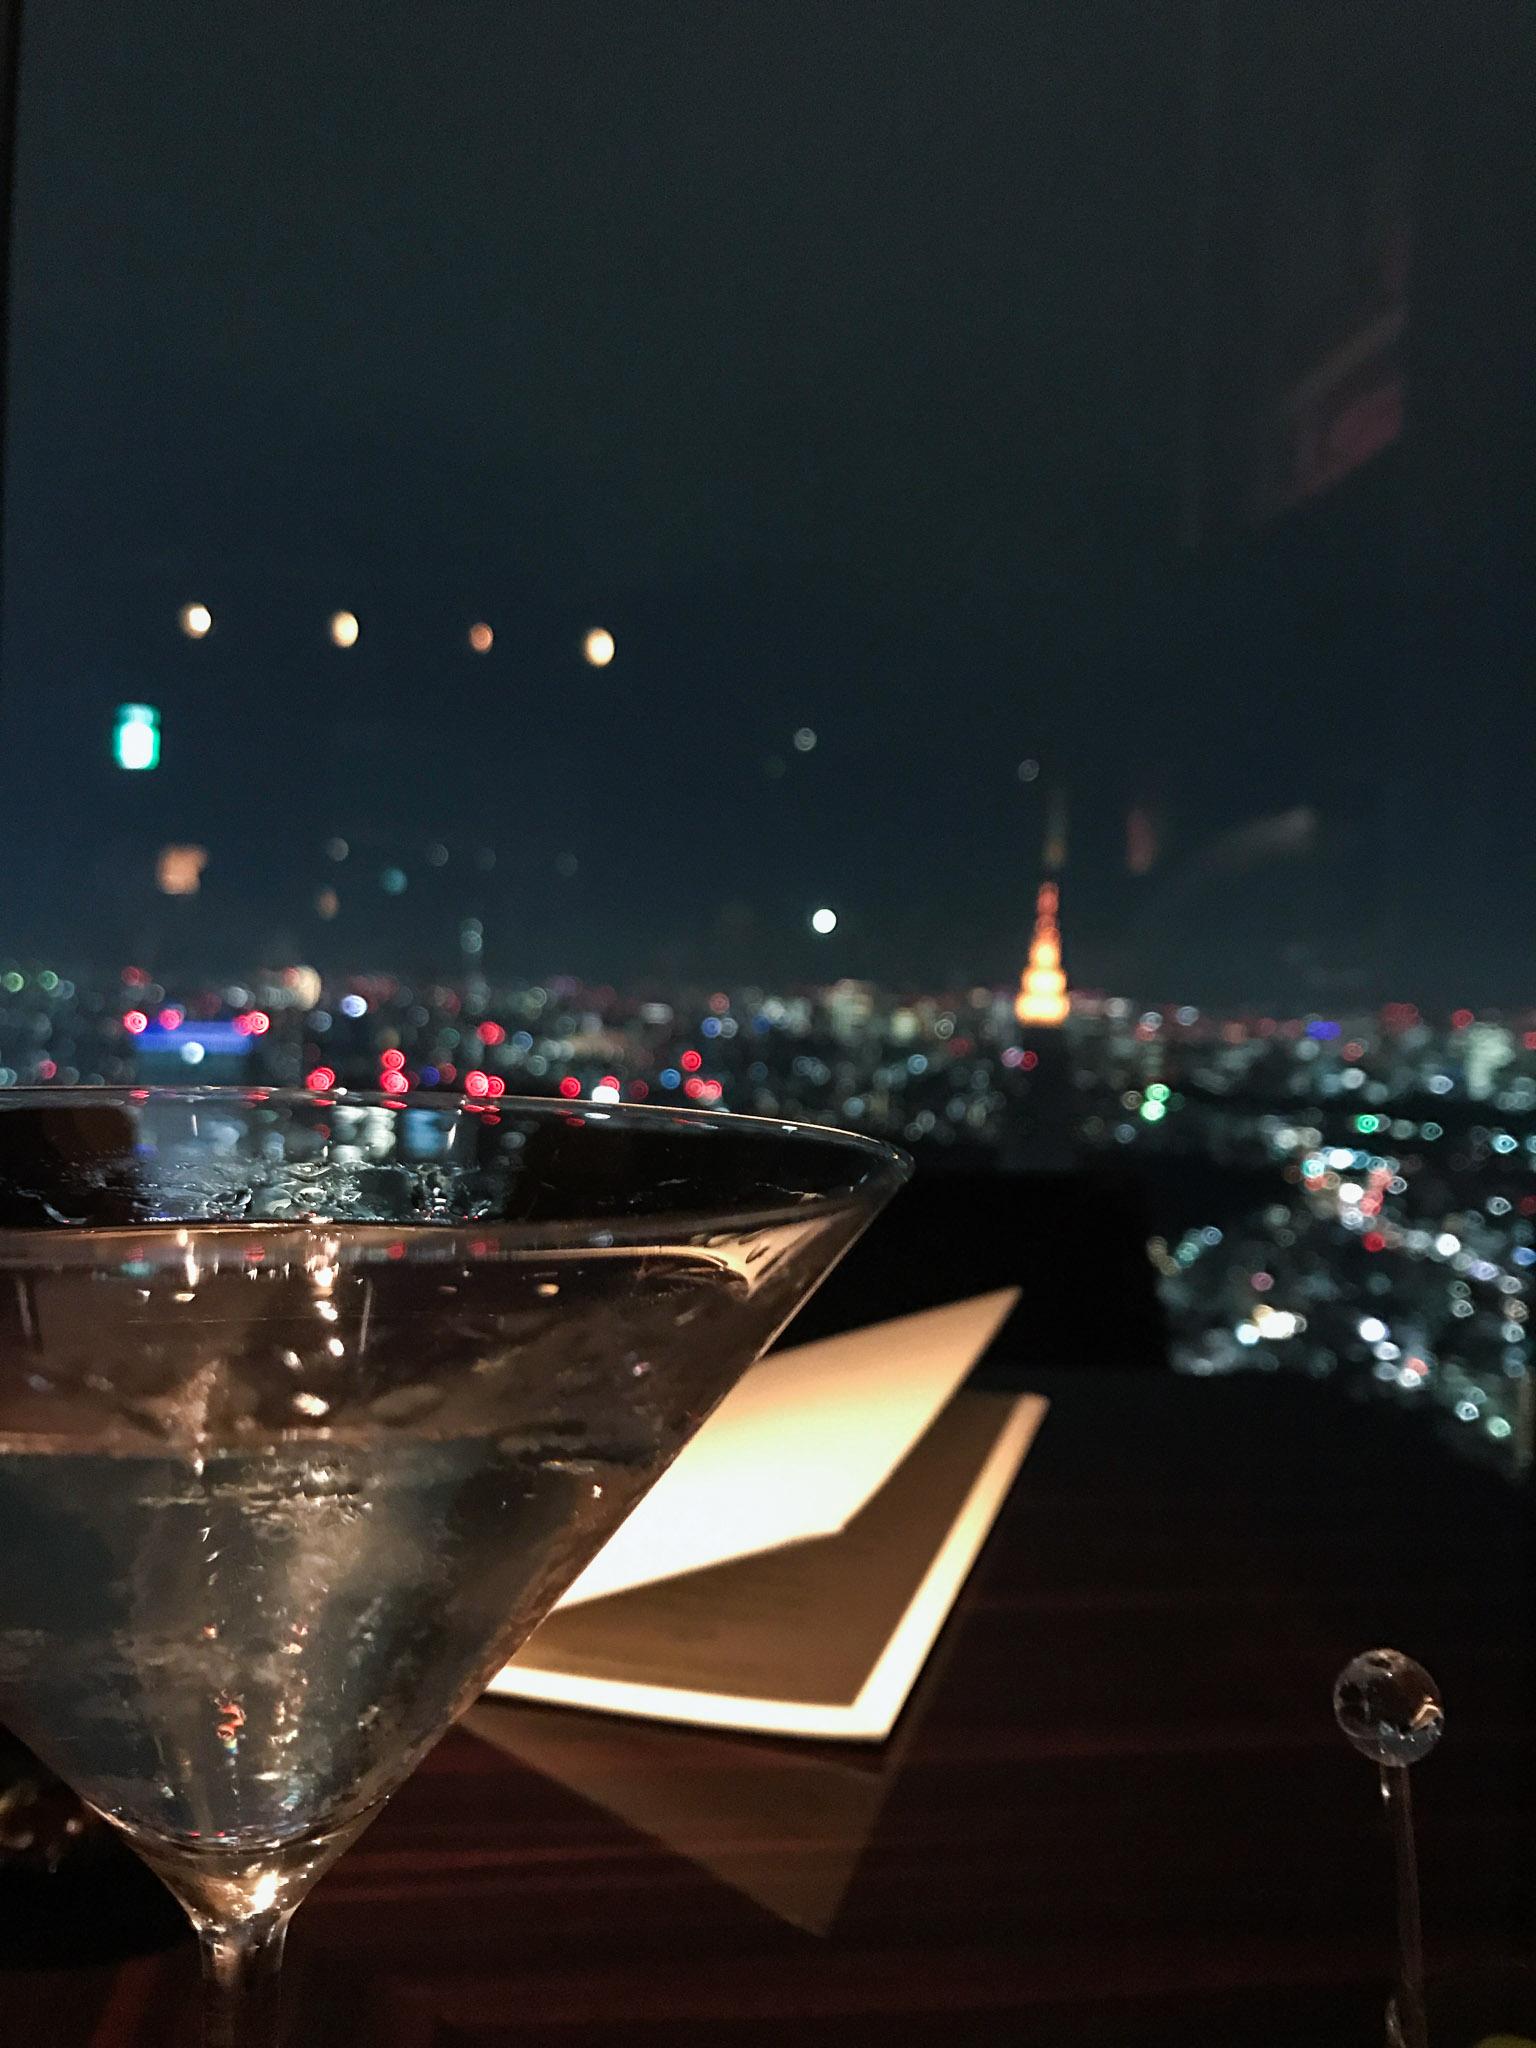 My gin martini and Tokyo skyline view.